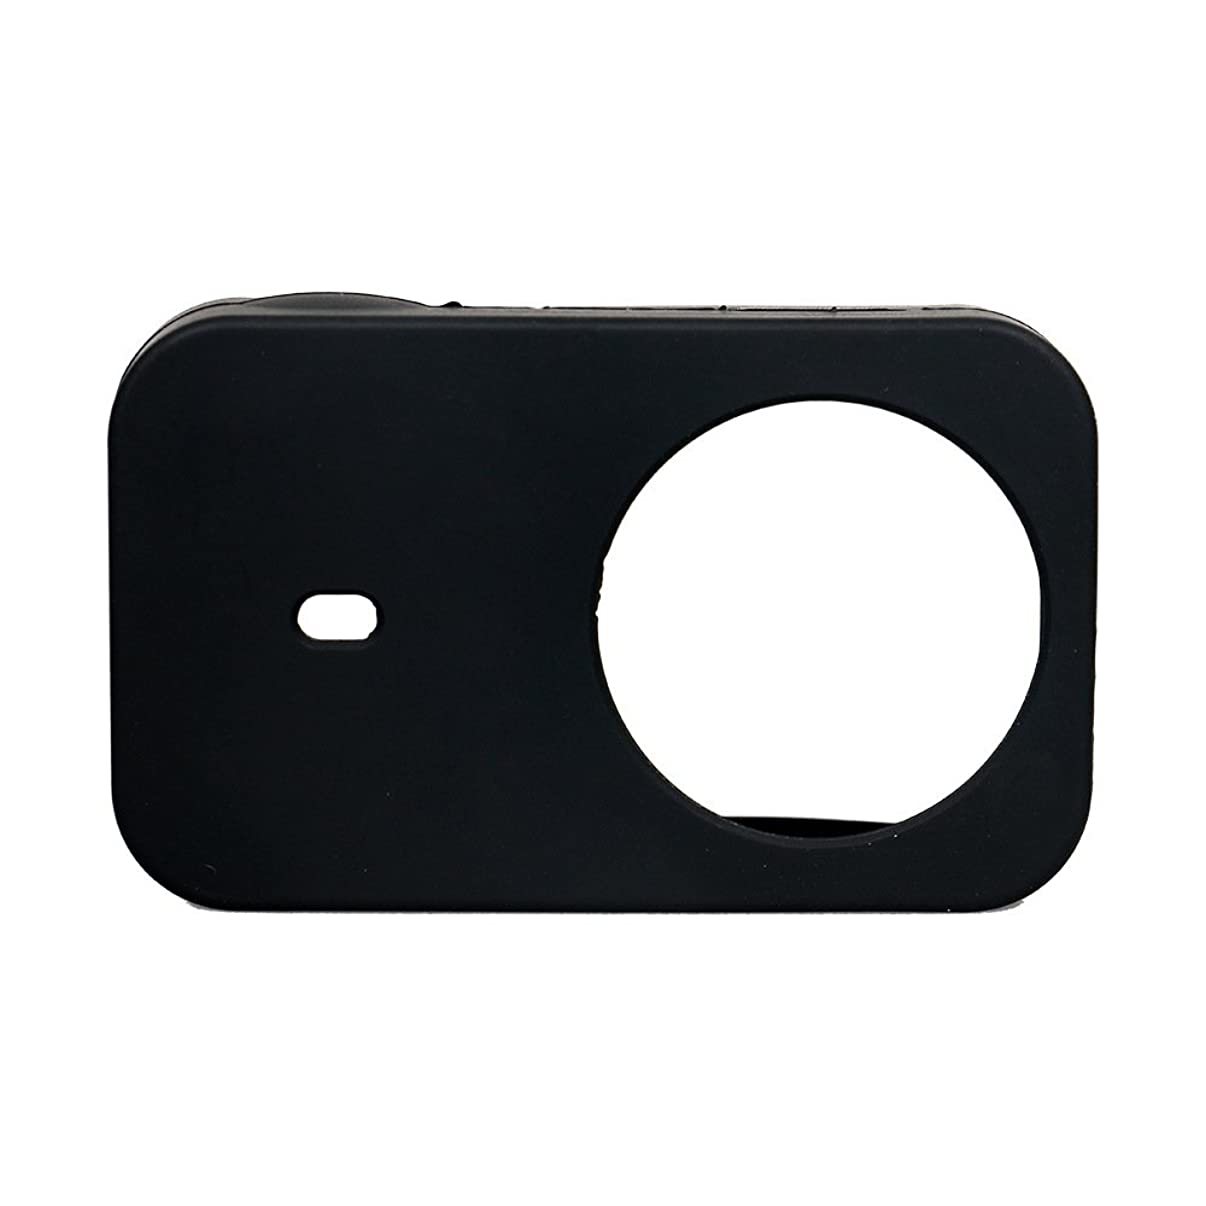 DESTINLEE For Xiaomi Mijia 4K Mini Action Camera Lens Silicone Housing Case Cap Cover